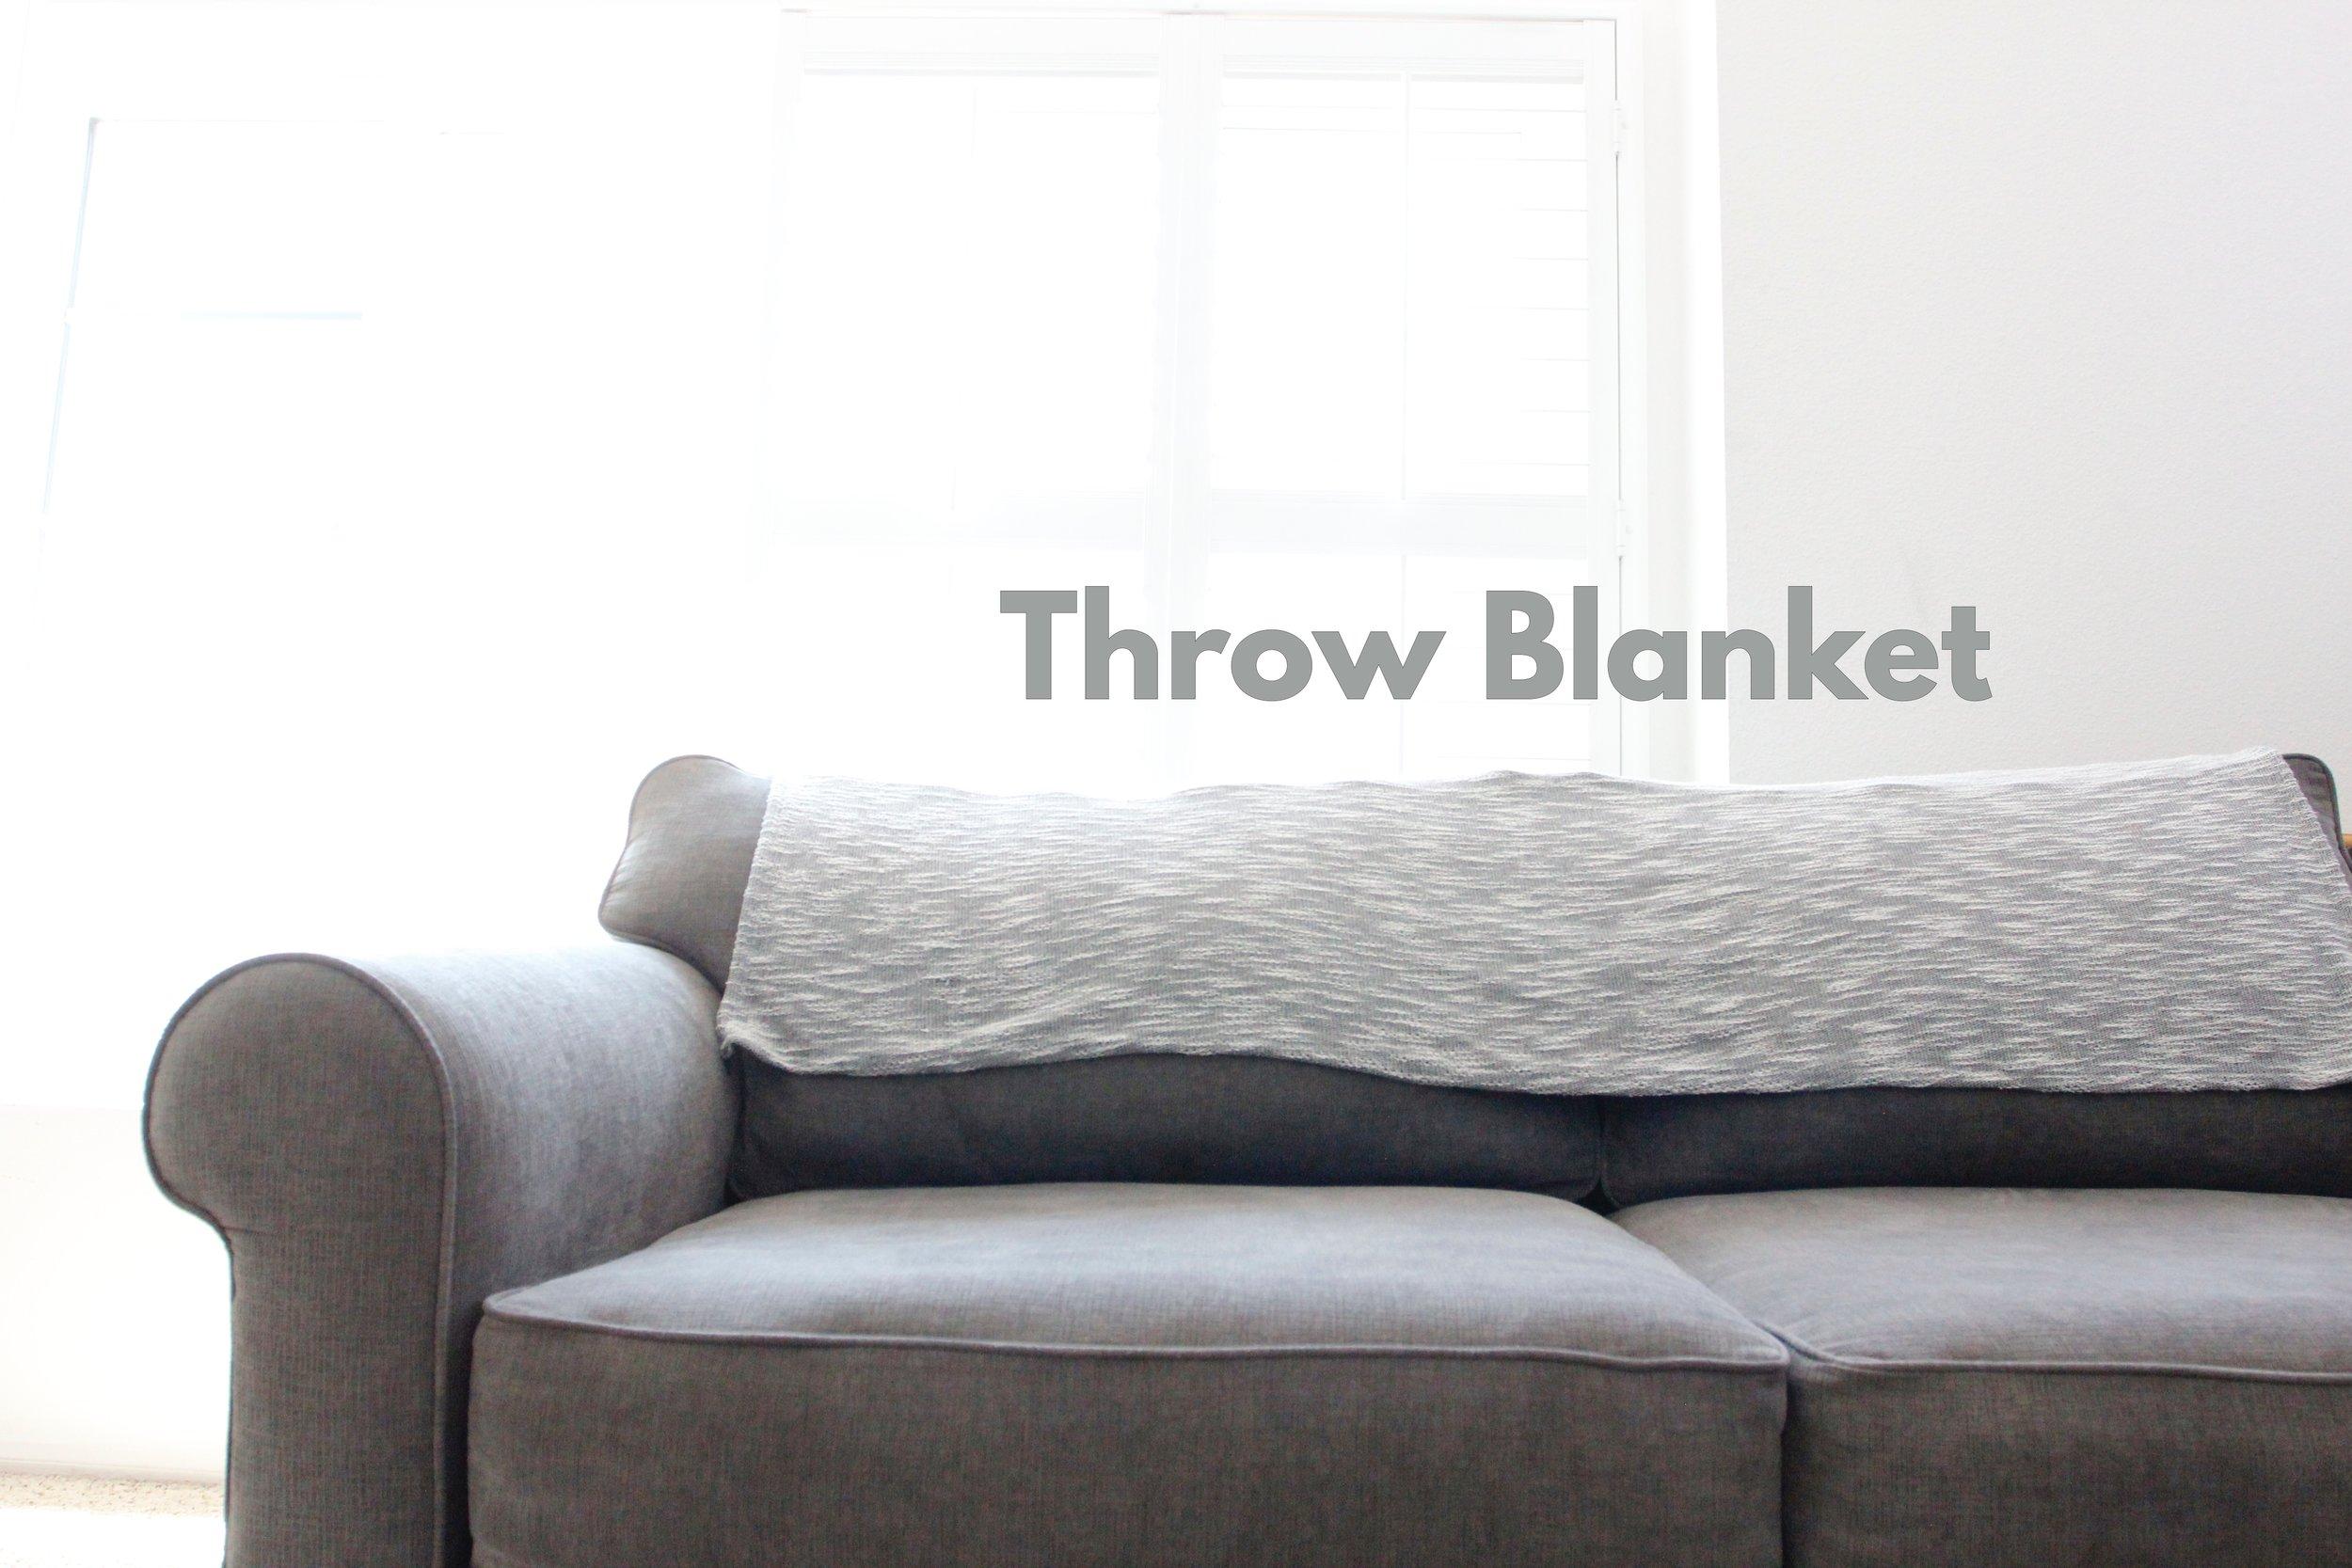 MFS ELLERALI48 throw blanket.jpg